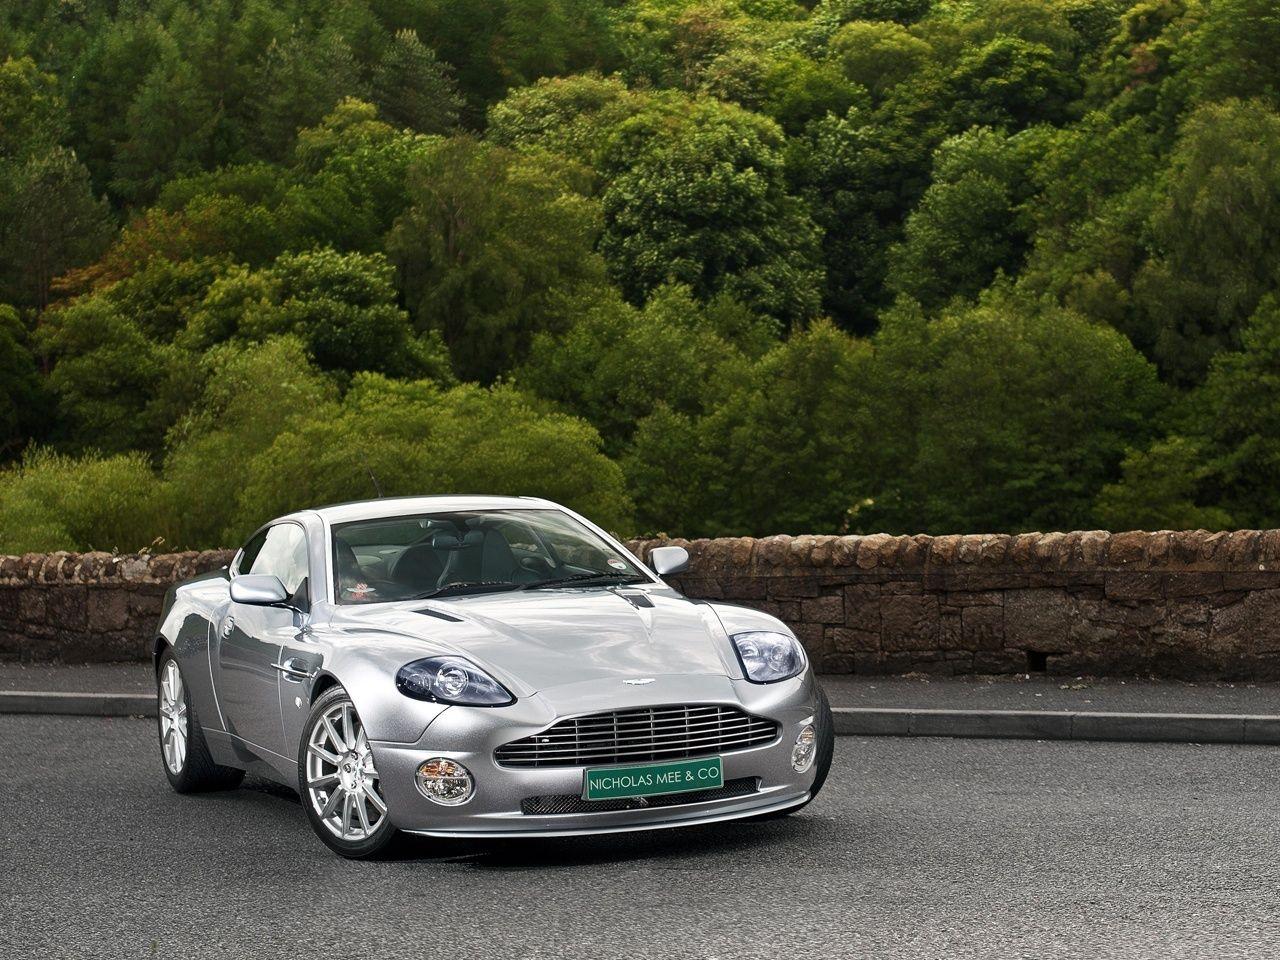 2007 Aston Martin Vanquish S Late Dash Classic Driver Market Aston Martin For Sale Aston Martin Aston Martin Cars